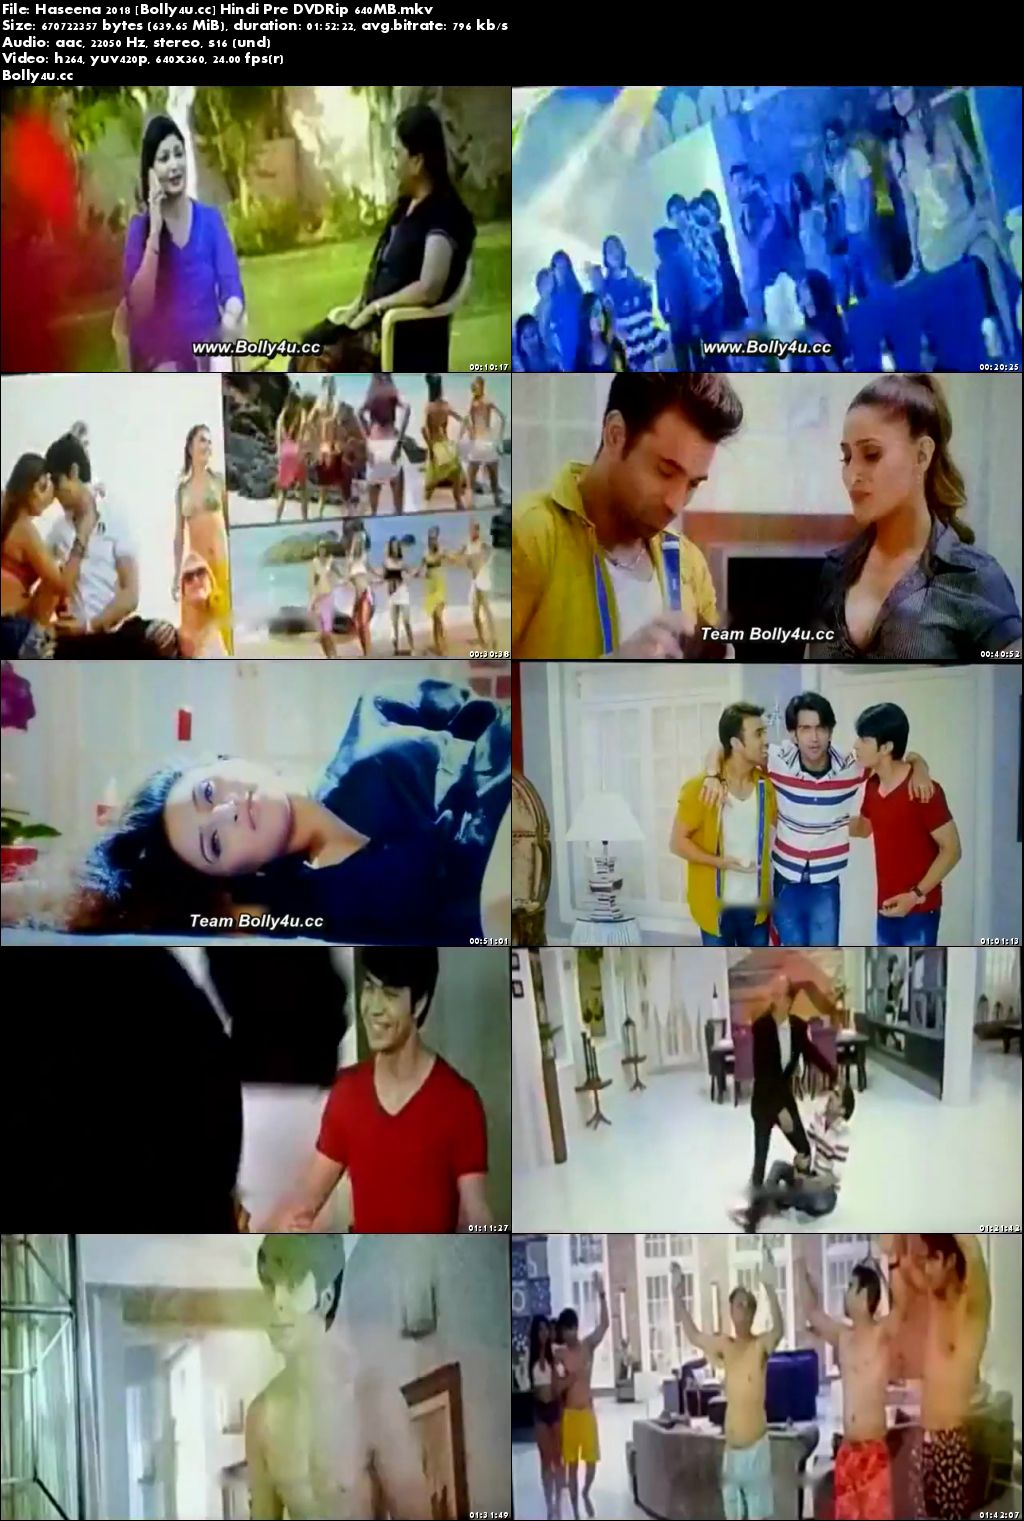 Haseena 2018 Pre DVDRip 350MB Full Hindi Movie Download 480p